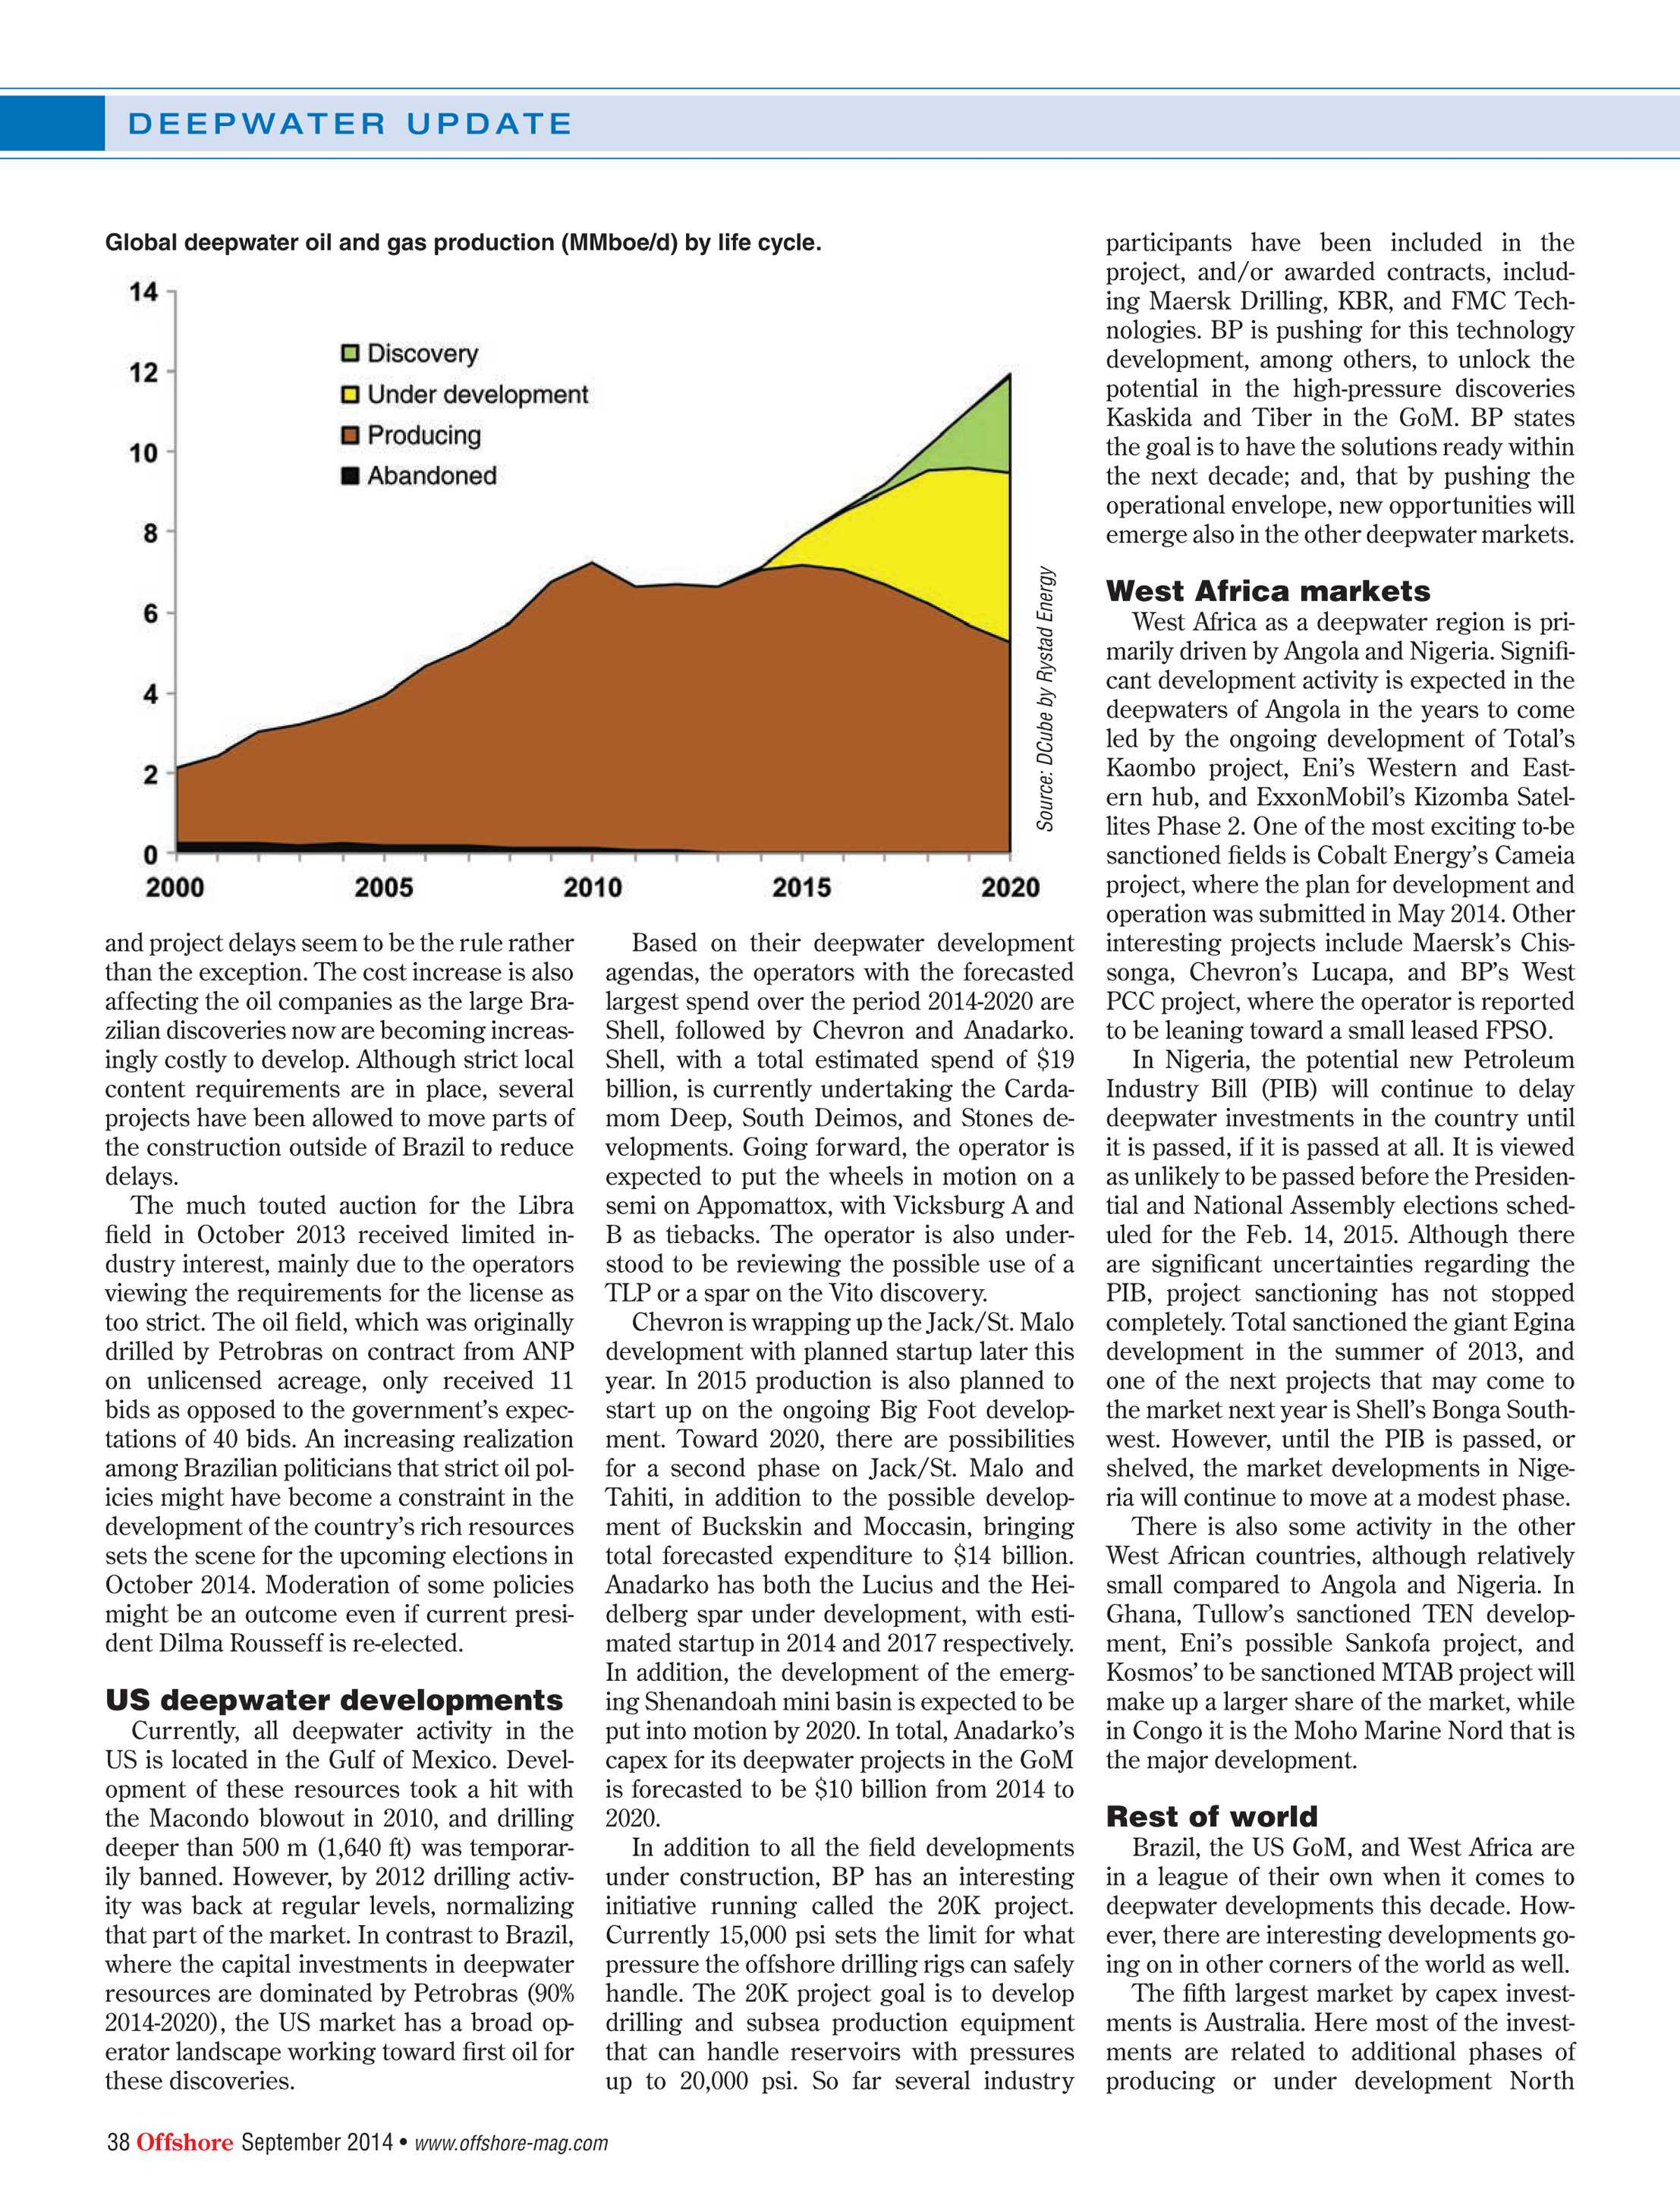 Texas Tech 2014-2020 Calendar Offshore Magazine   September 2014   page 38